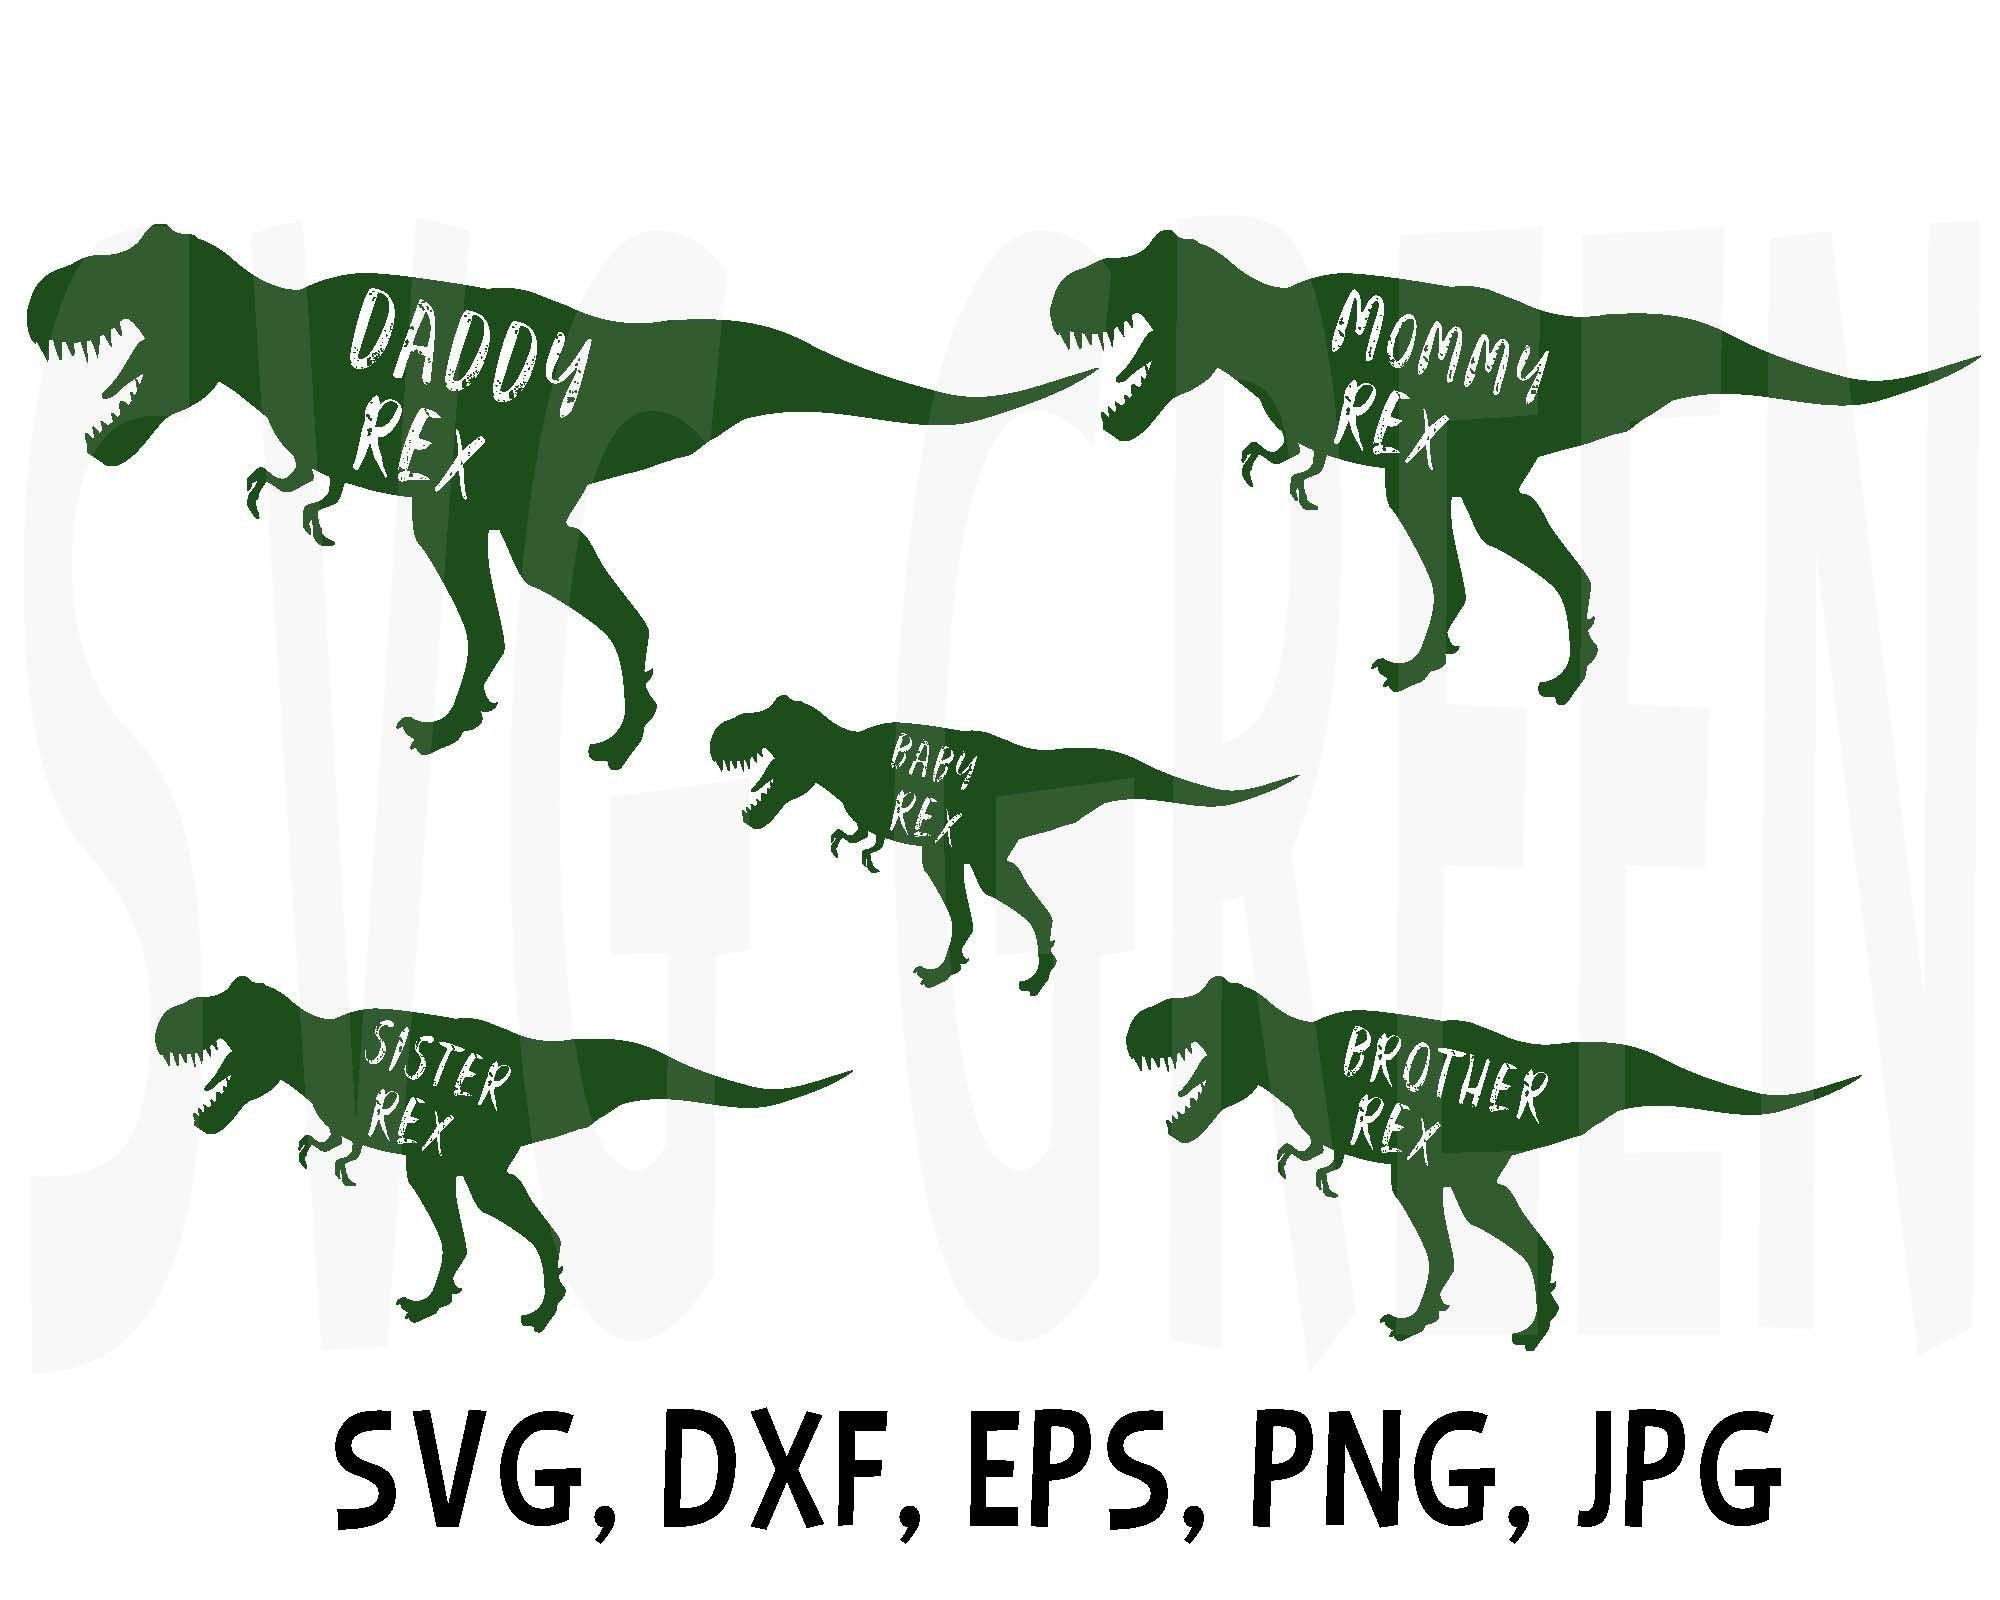 Cricut Dinosaur Svg Dinosaur Grandma Of The Birthday Boy Svg Dinosaur Shirt Design Dxf Silhouette Jpg T-Rex Svg Sublimation Png